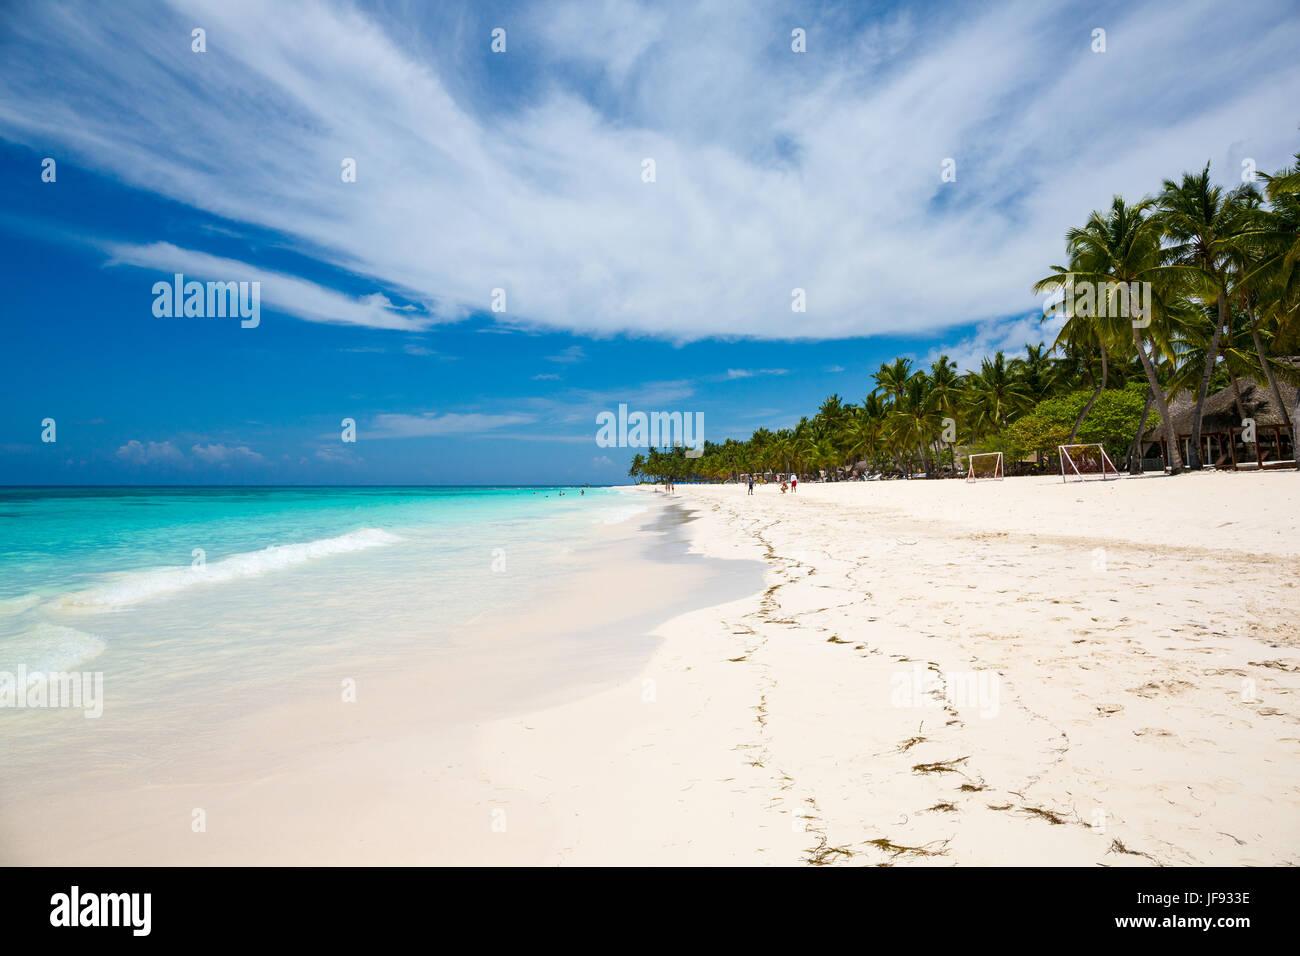 beach at Saona island, Dominican Republic - Stock Image